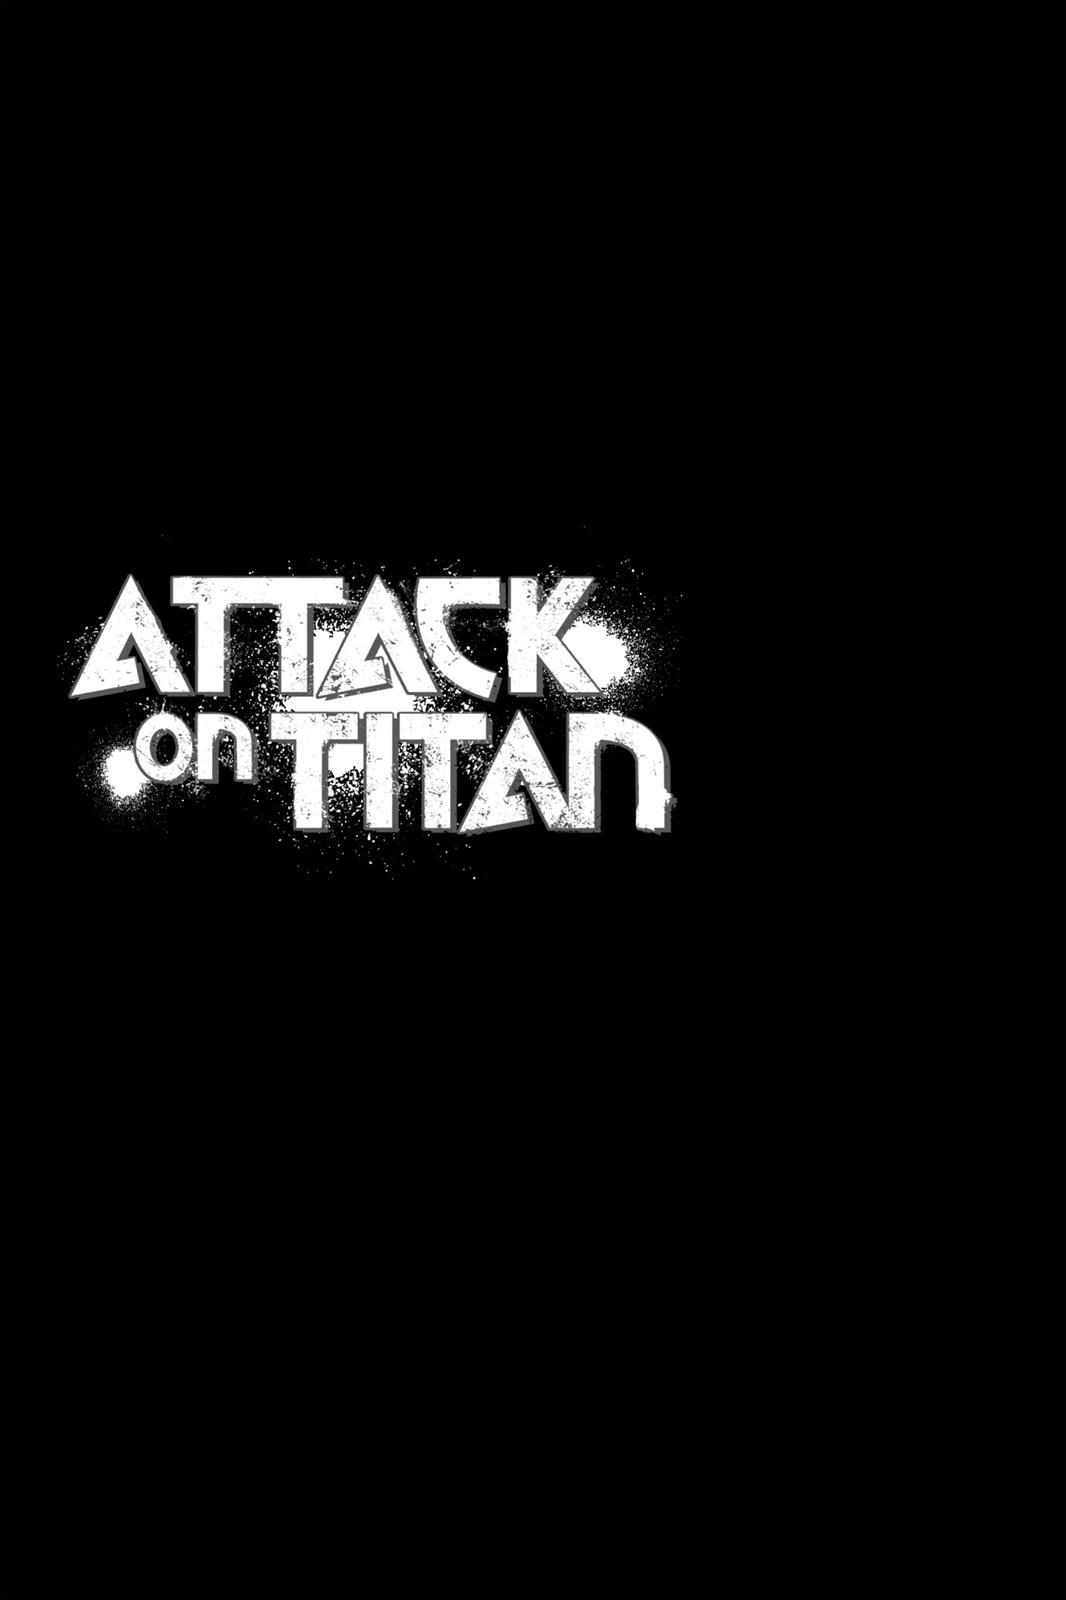 Attack On Titan, Episode 49 image 044